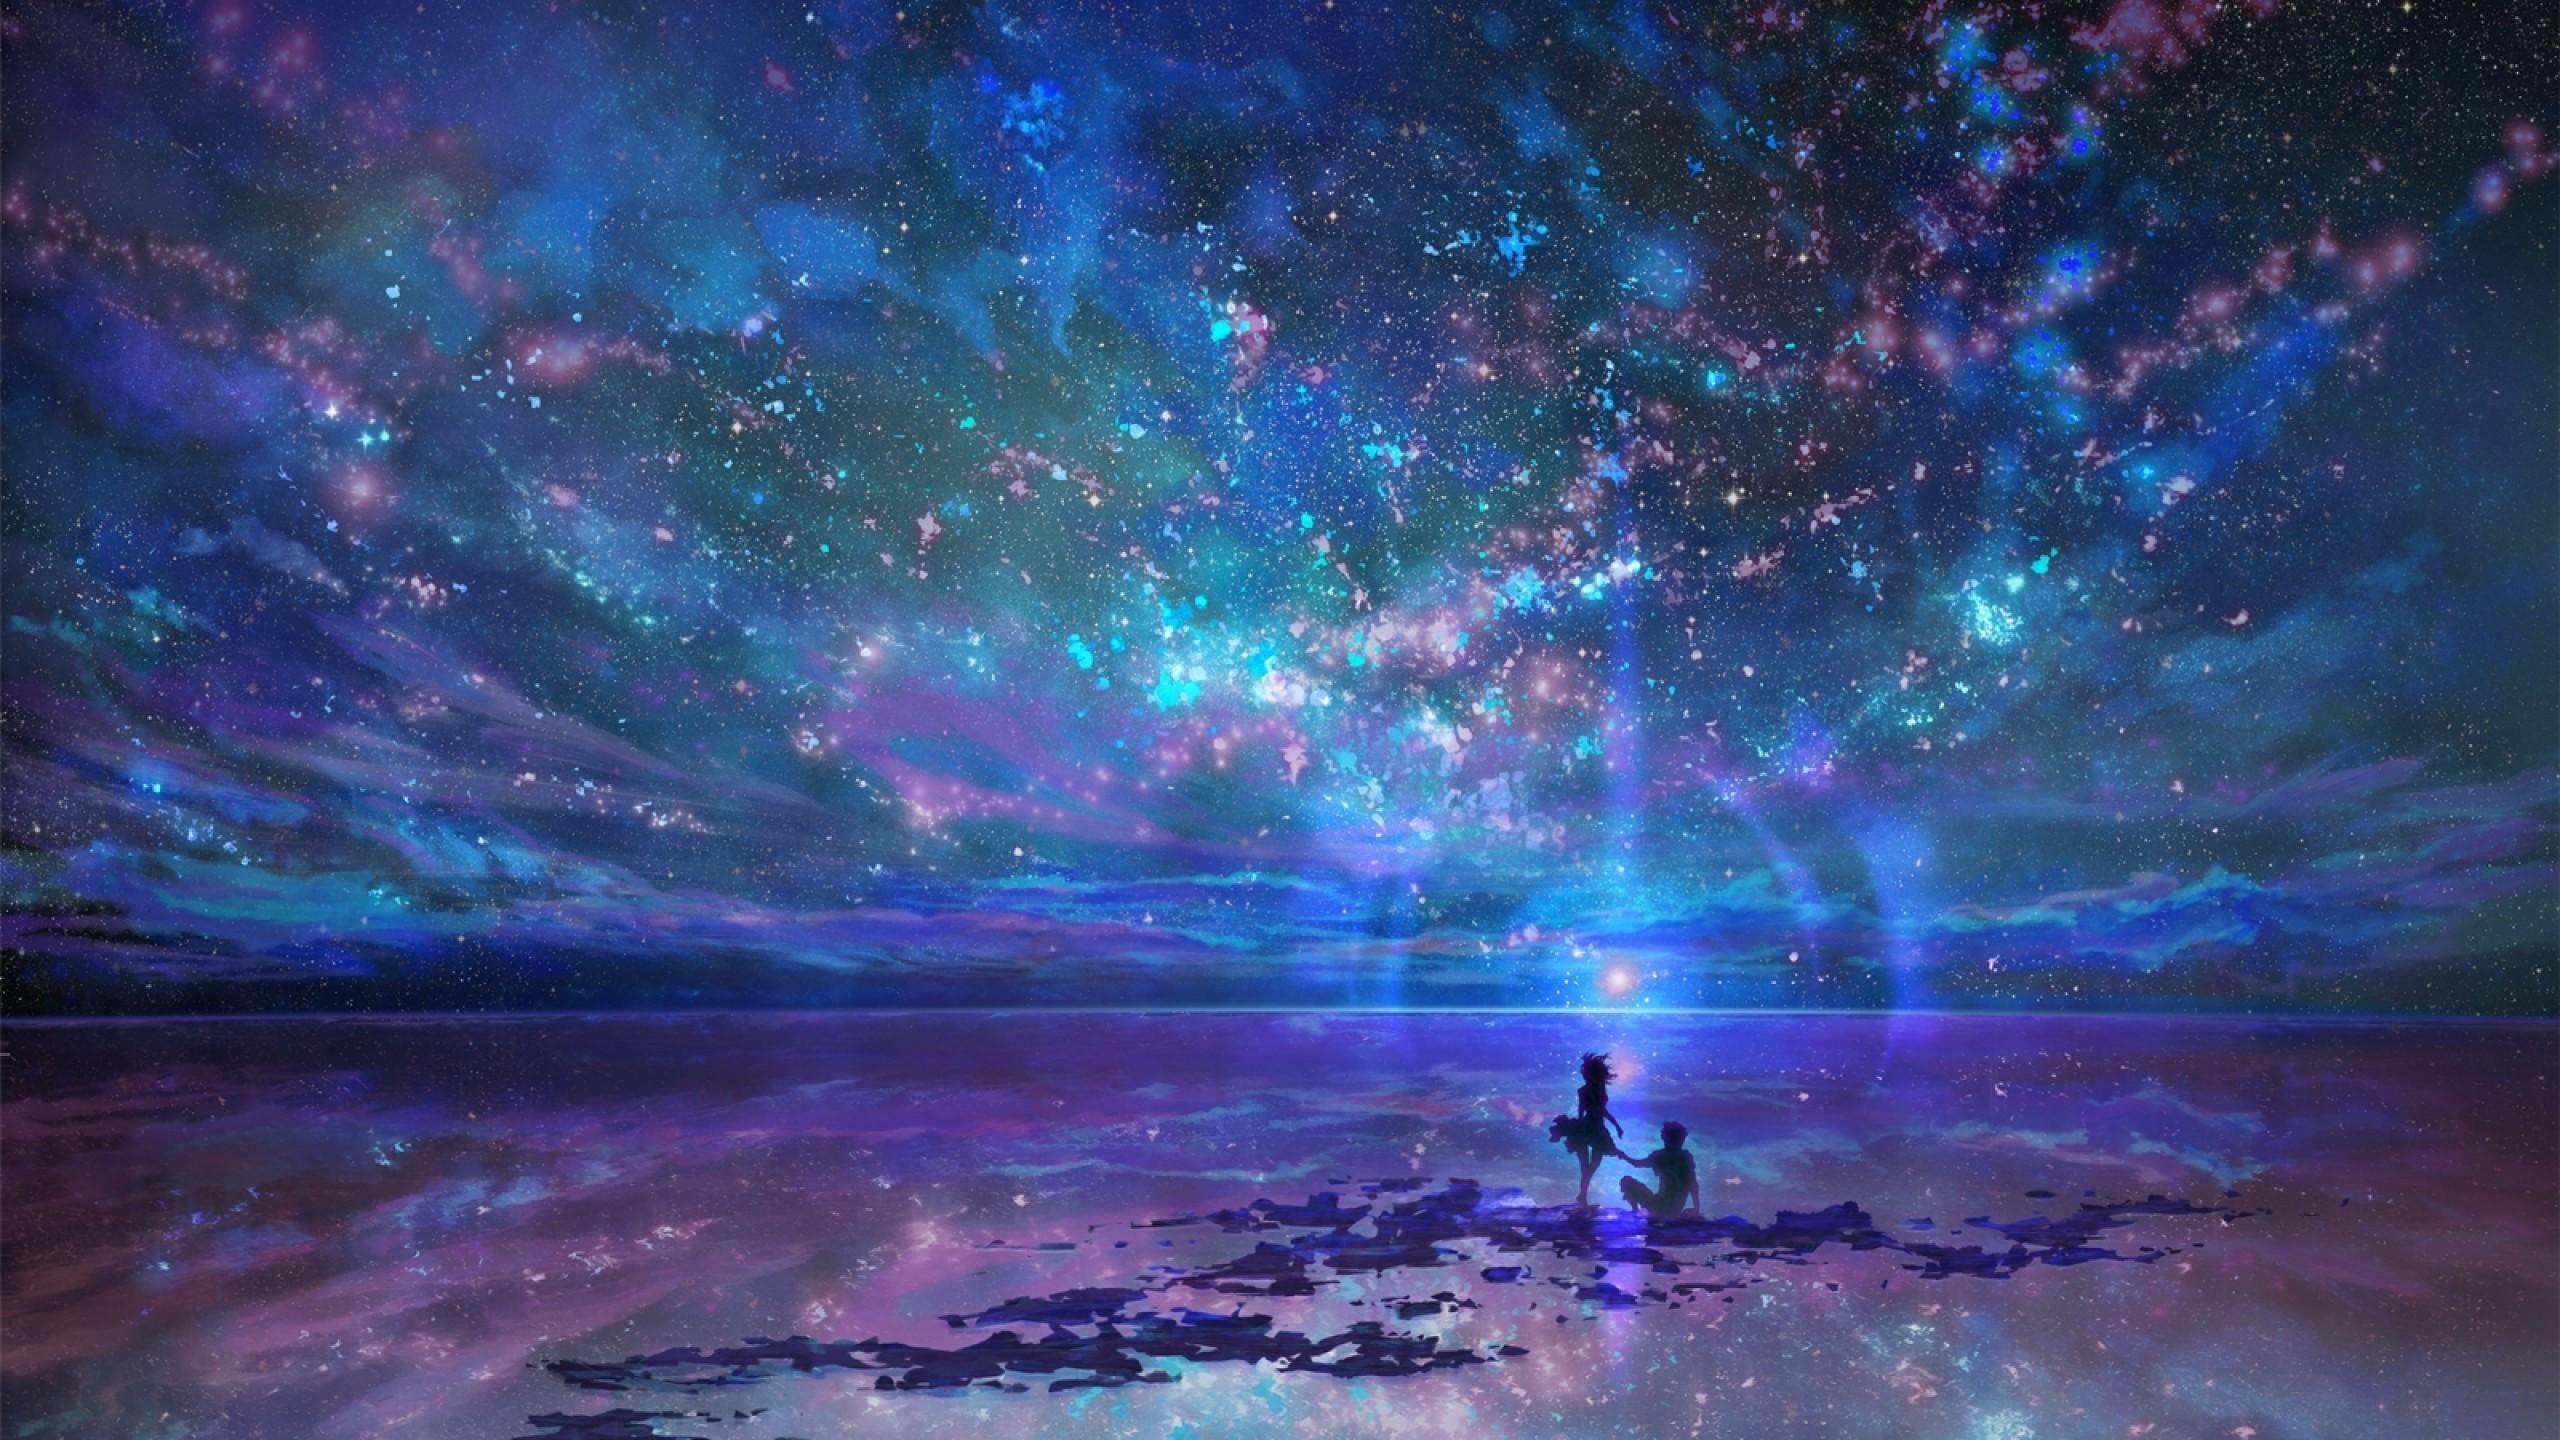 Anime Couple, Scenic, Stars, Night, Sky, Silhouette